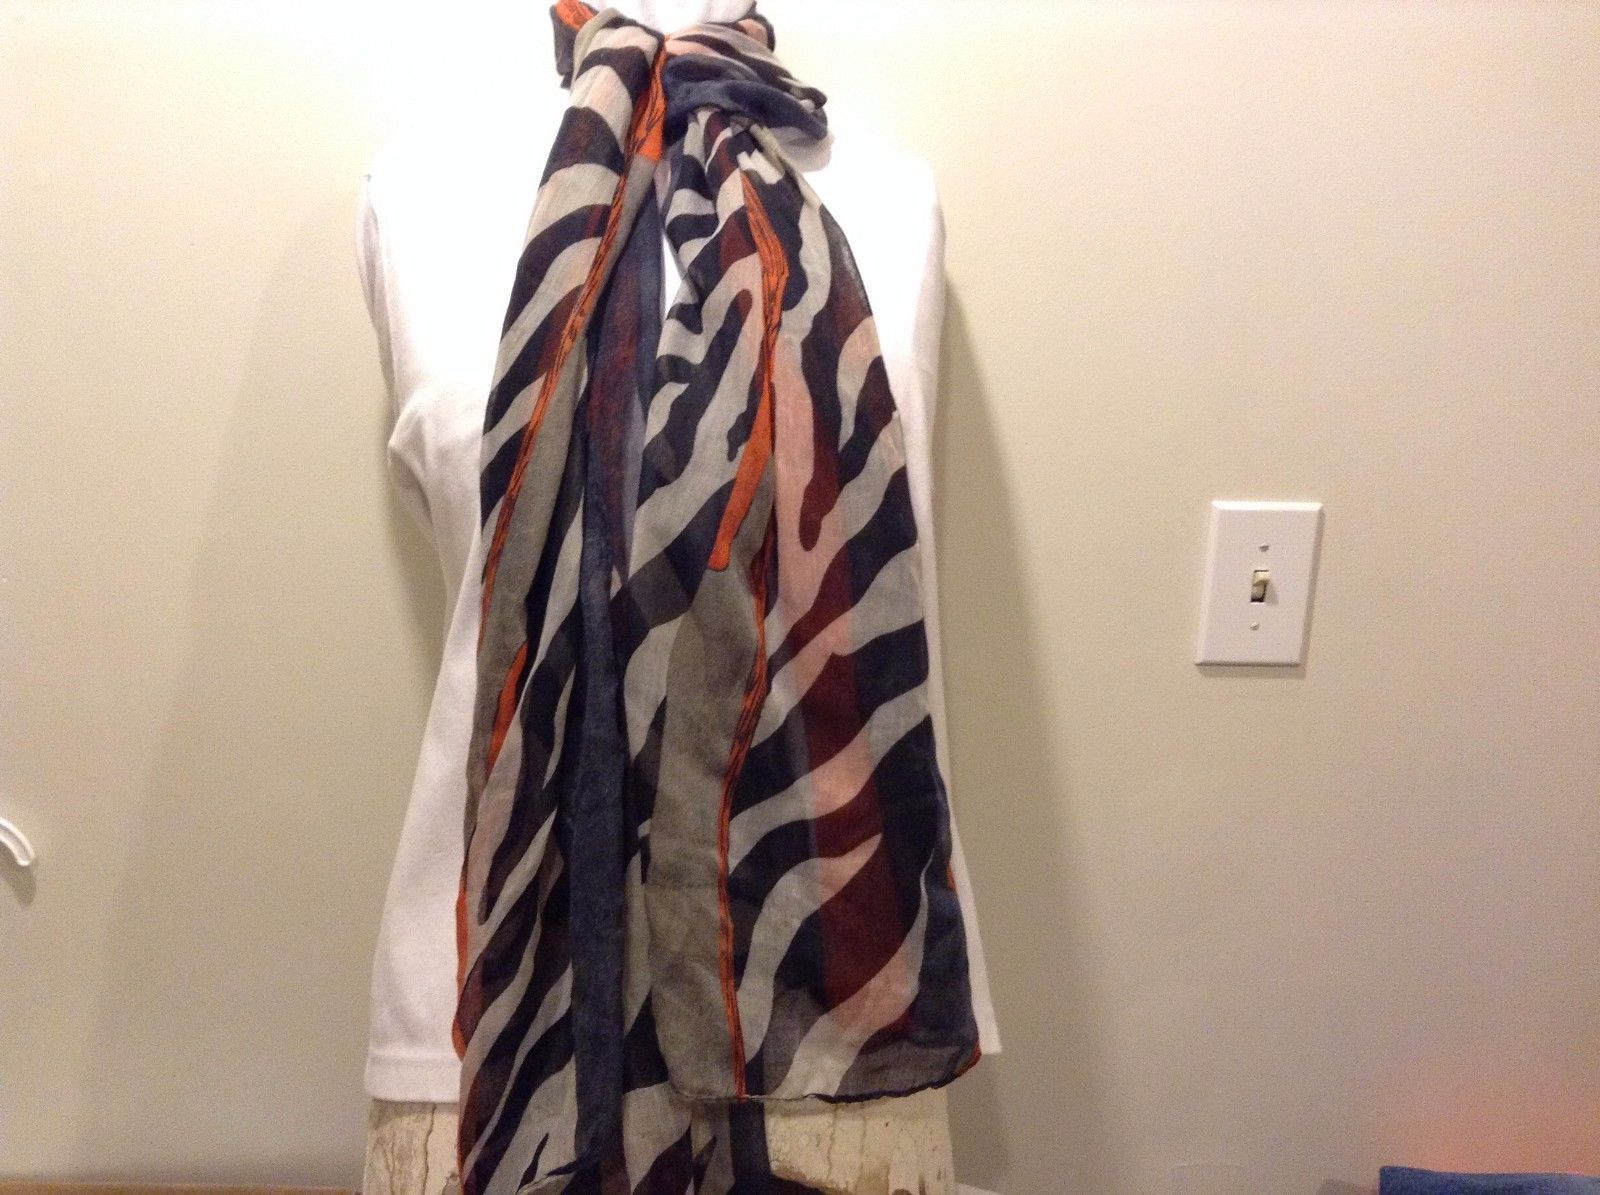 Black White Blue Orange Gray Zebra Circles Stripes Sheer Scarf 100% Polyester